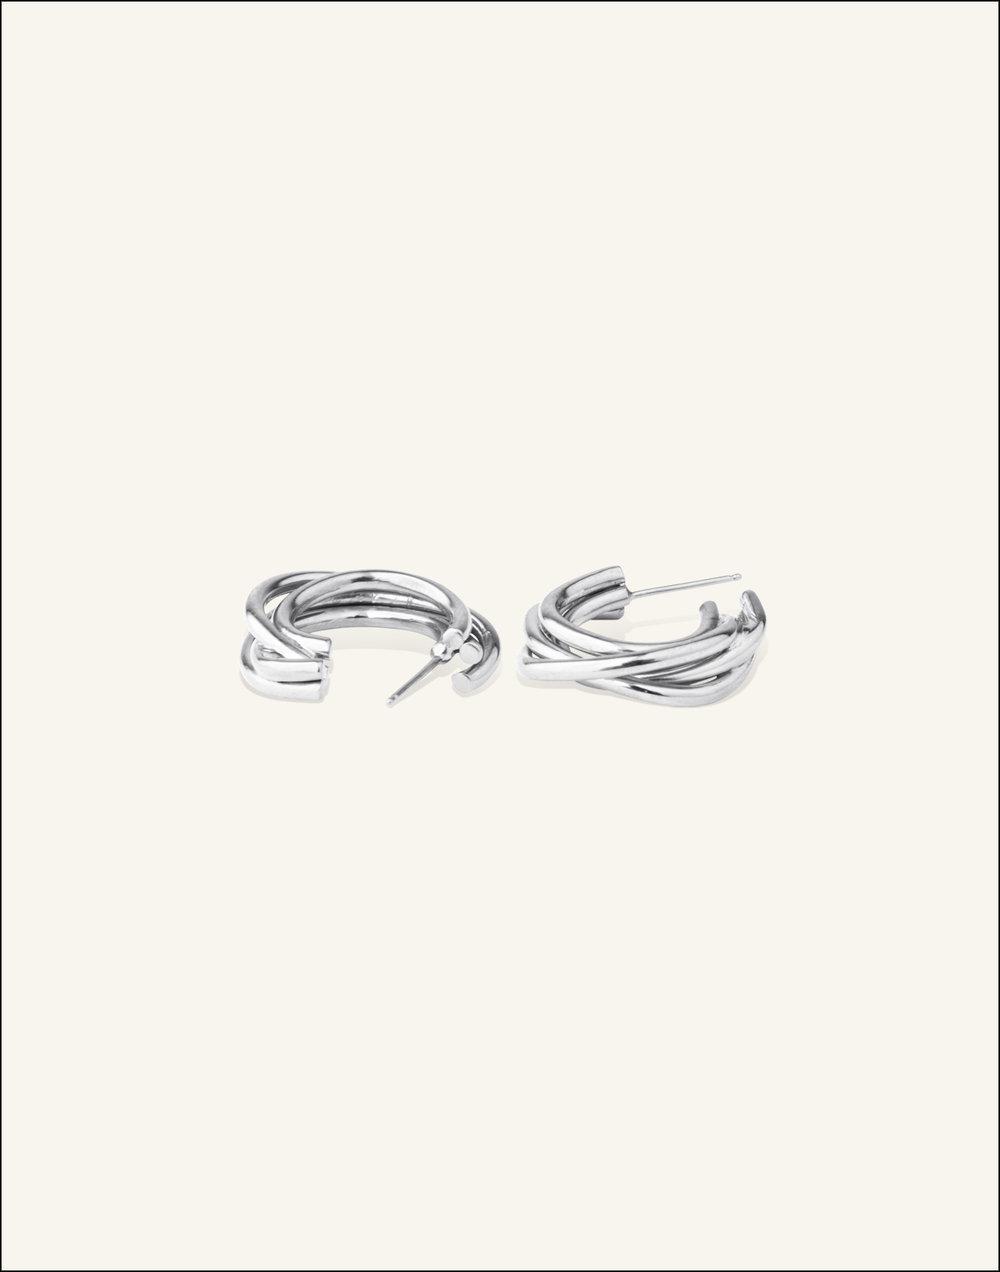 Completedworks-Silver-Earrings-An-Encounter-3-1.jpg